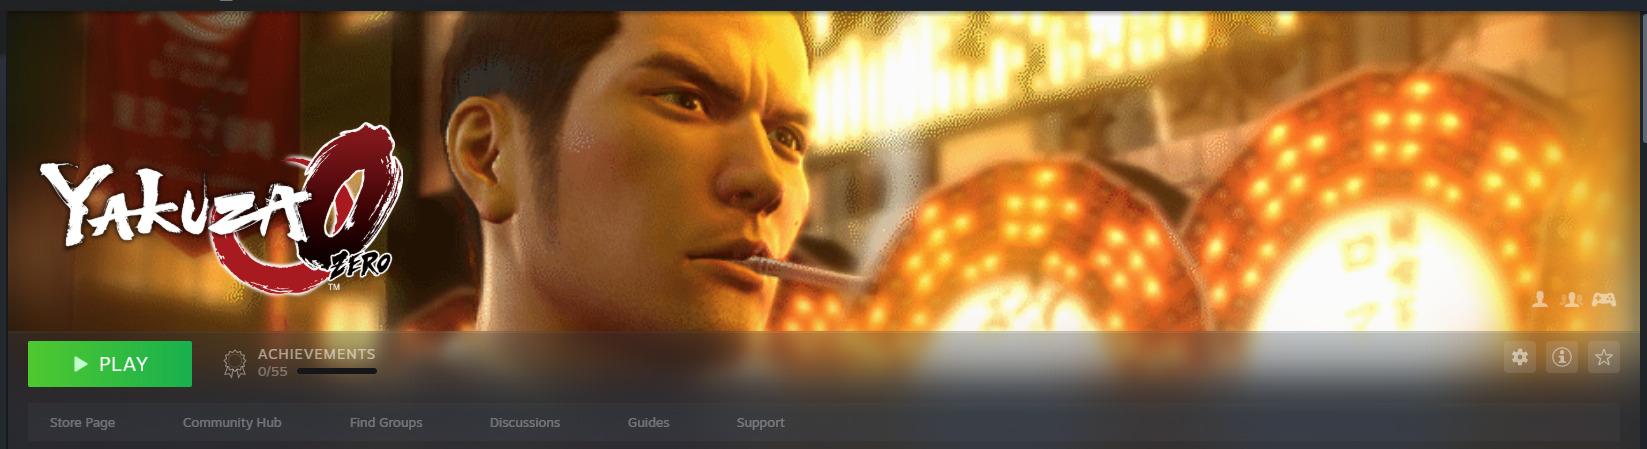 Upgrade PC verzí Yakuzy 0 a Kiwami na Deluxe edici zdarma yakuza banner